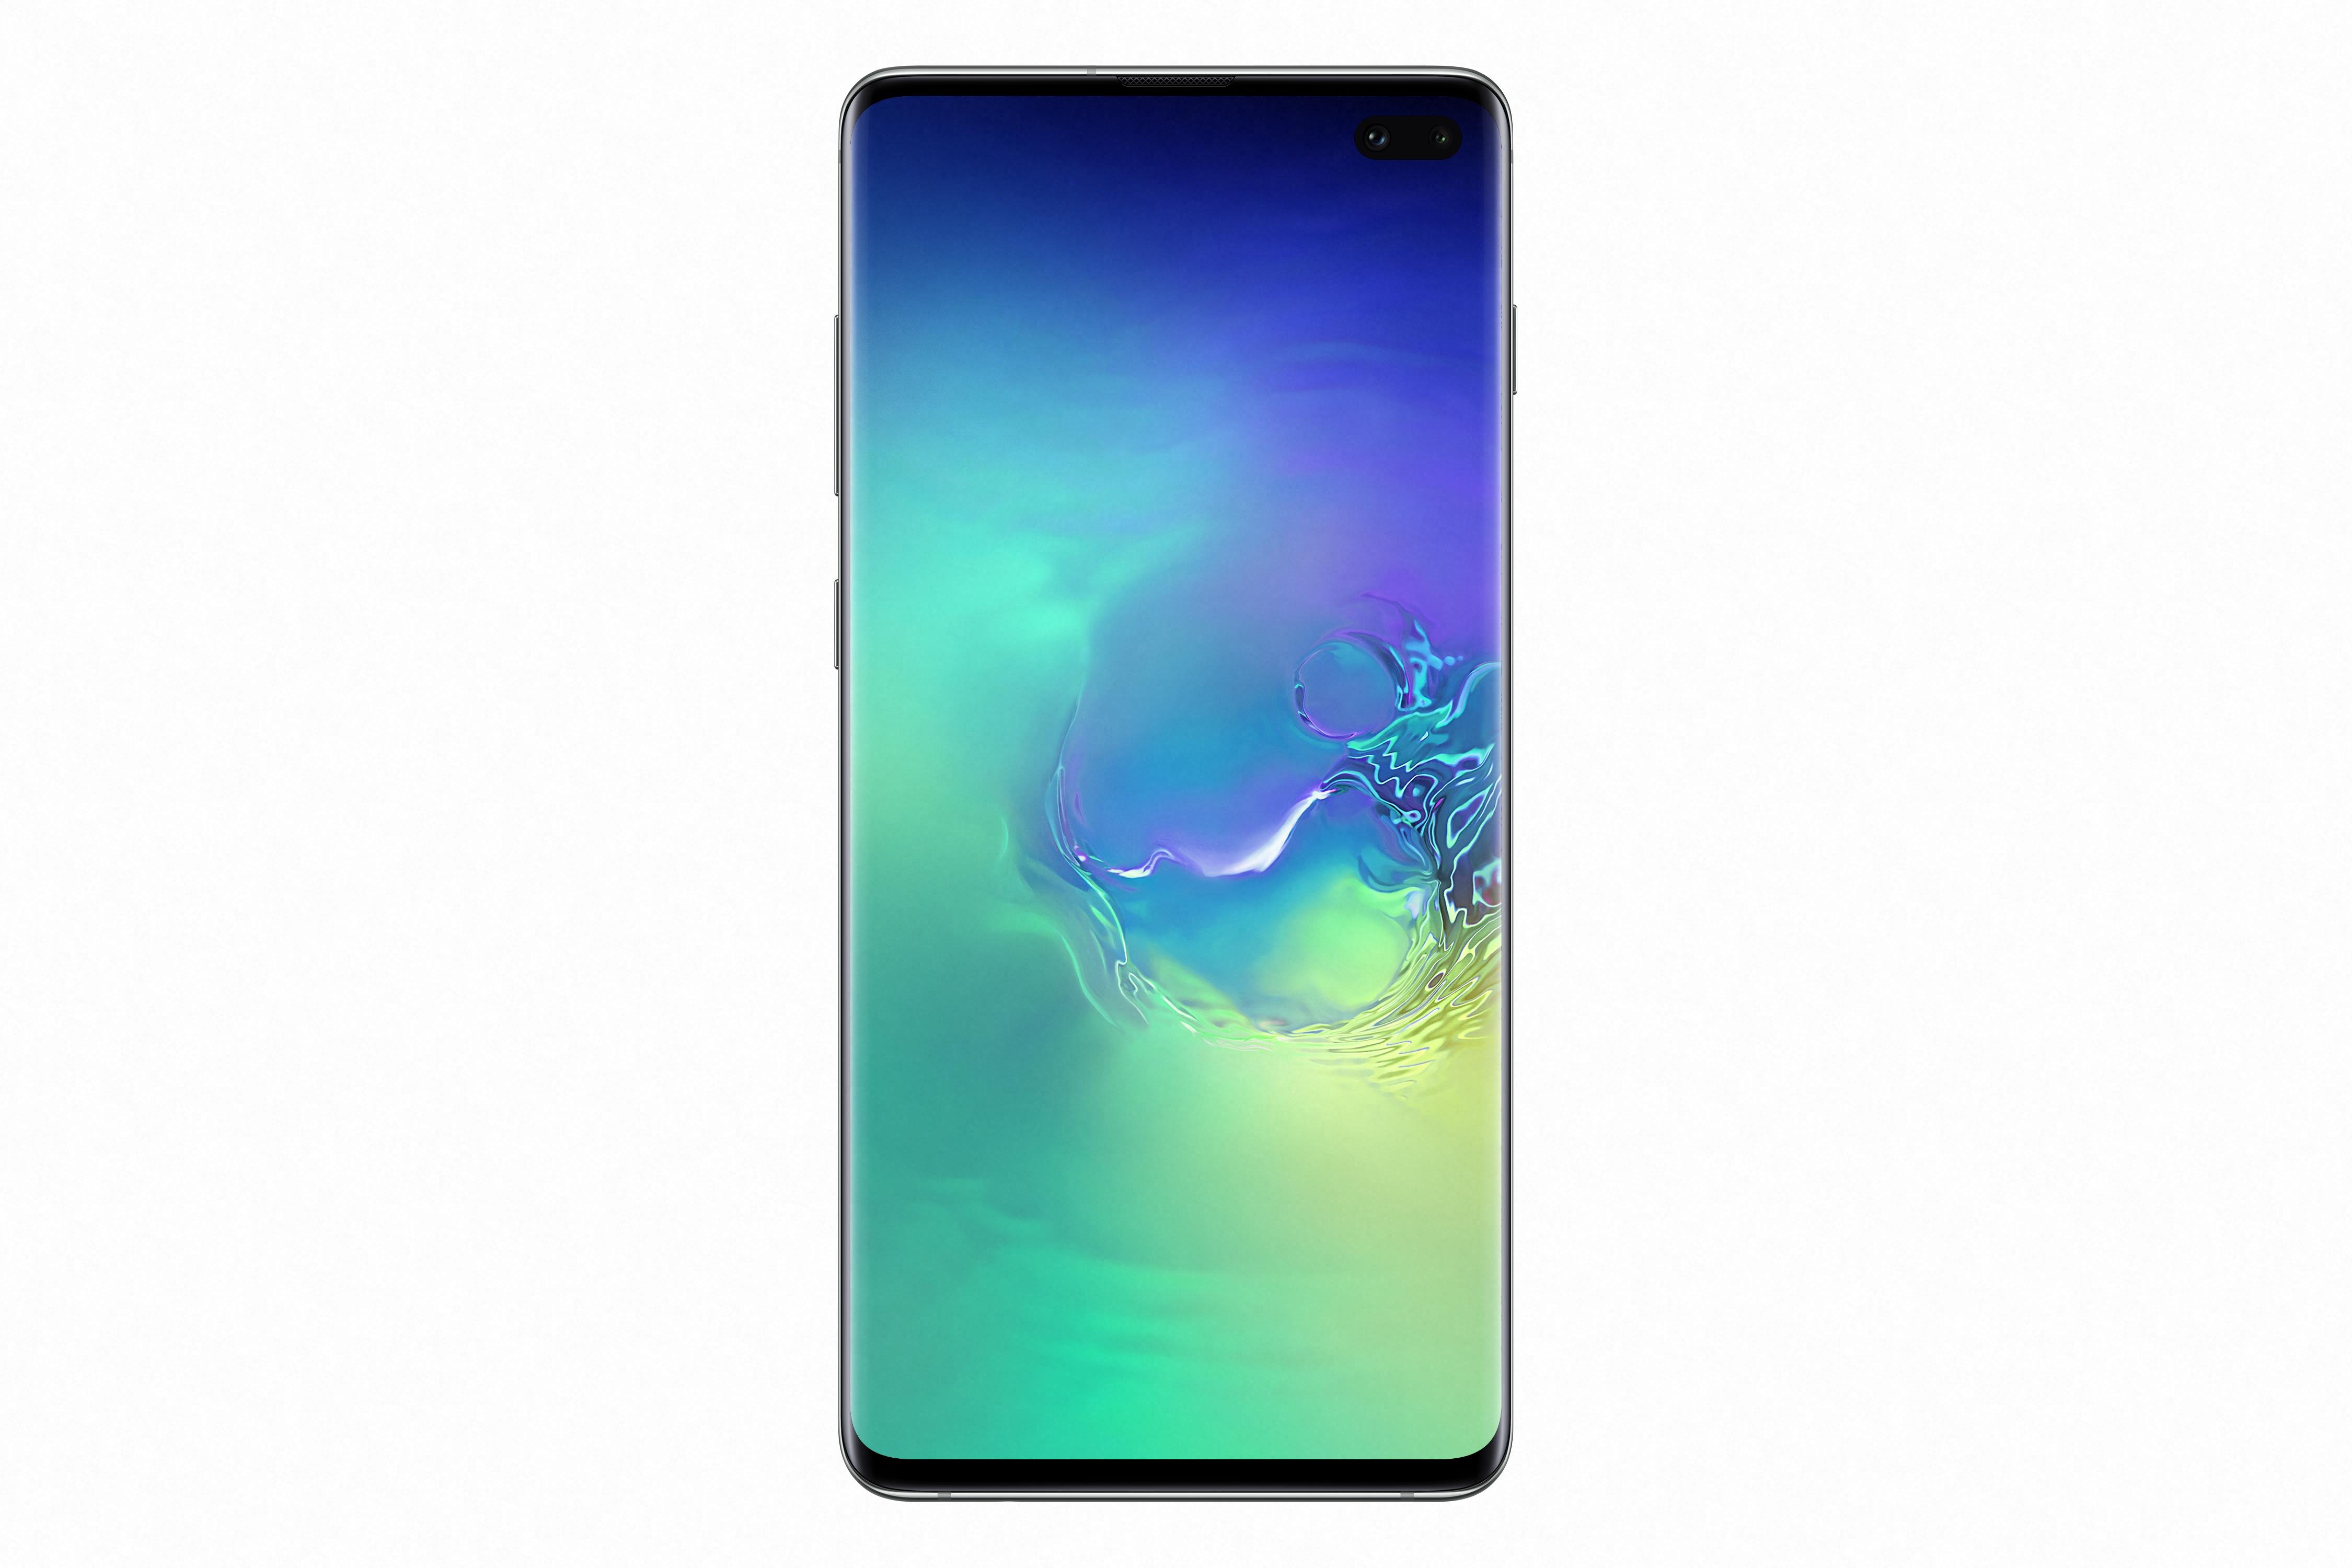 Telefon Mobil Samsung Galaxy S10+ G975 128GB Flash 8GB RAM Dual SIM 4G Teal Green